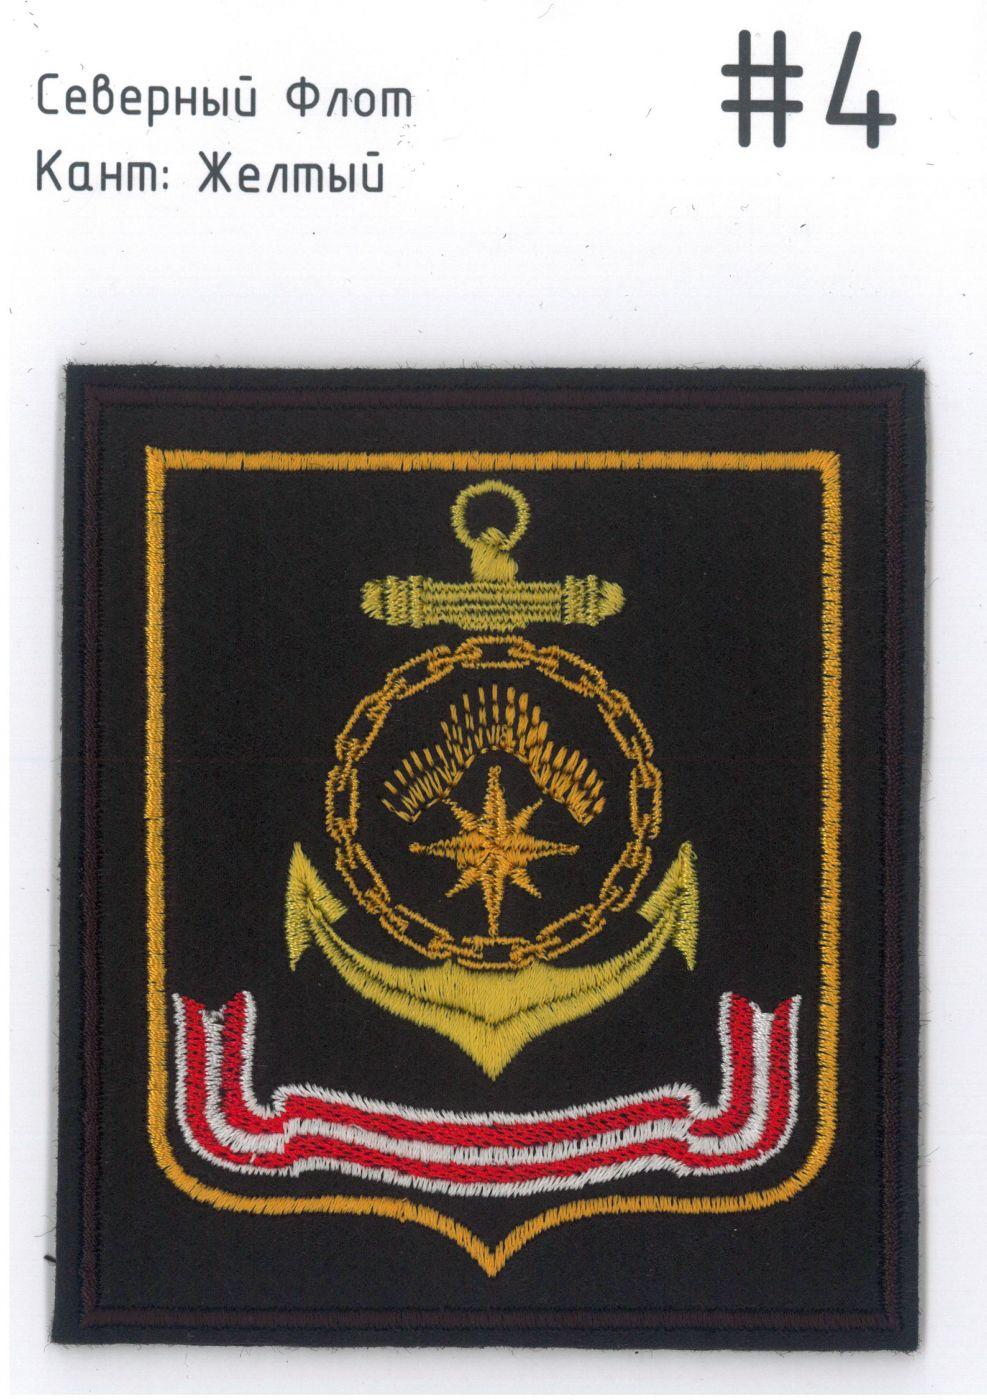 Шеврон Северного Флота